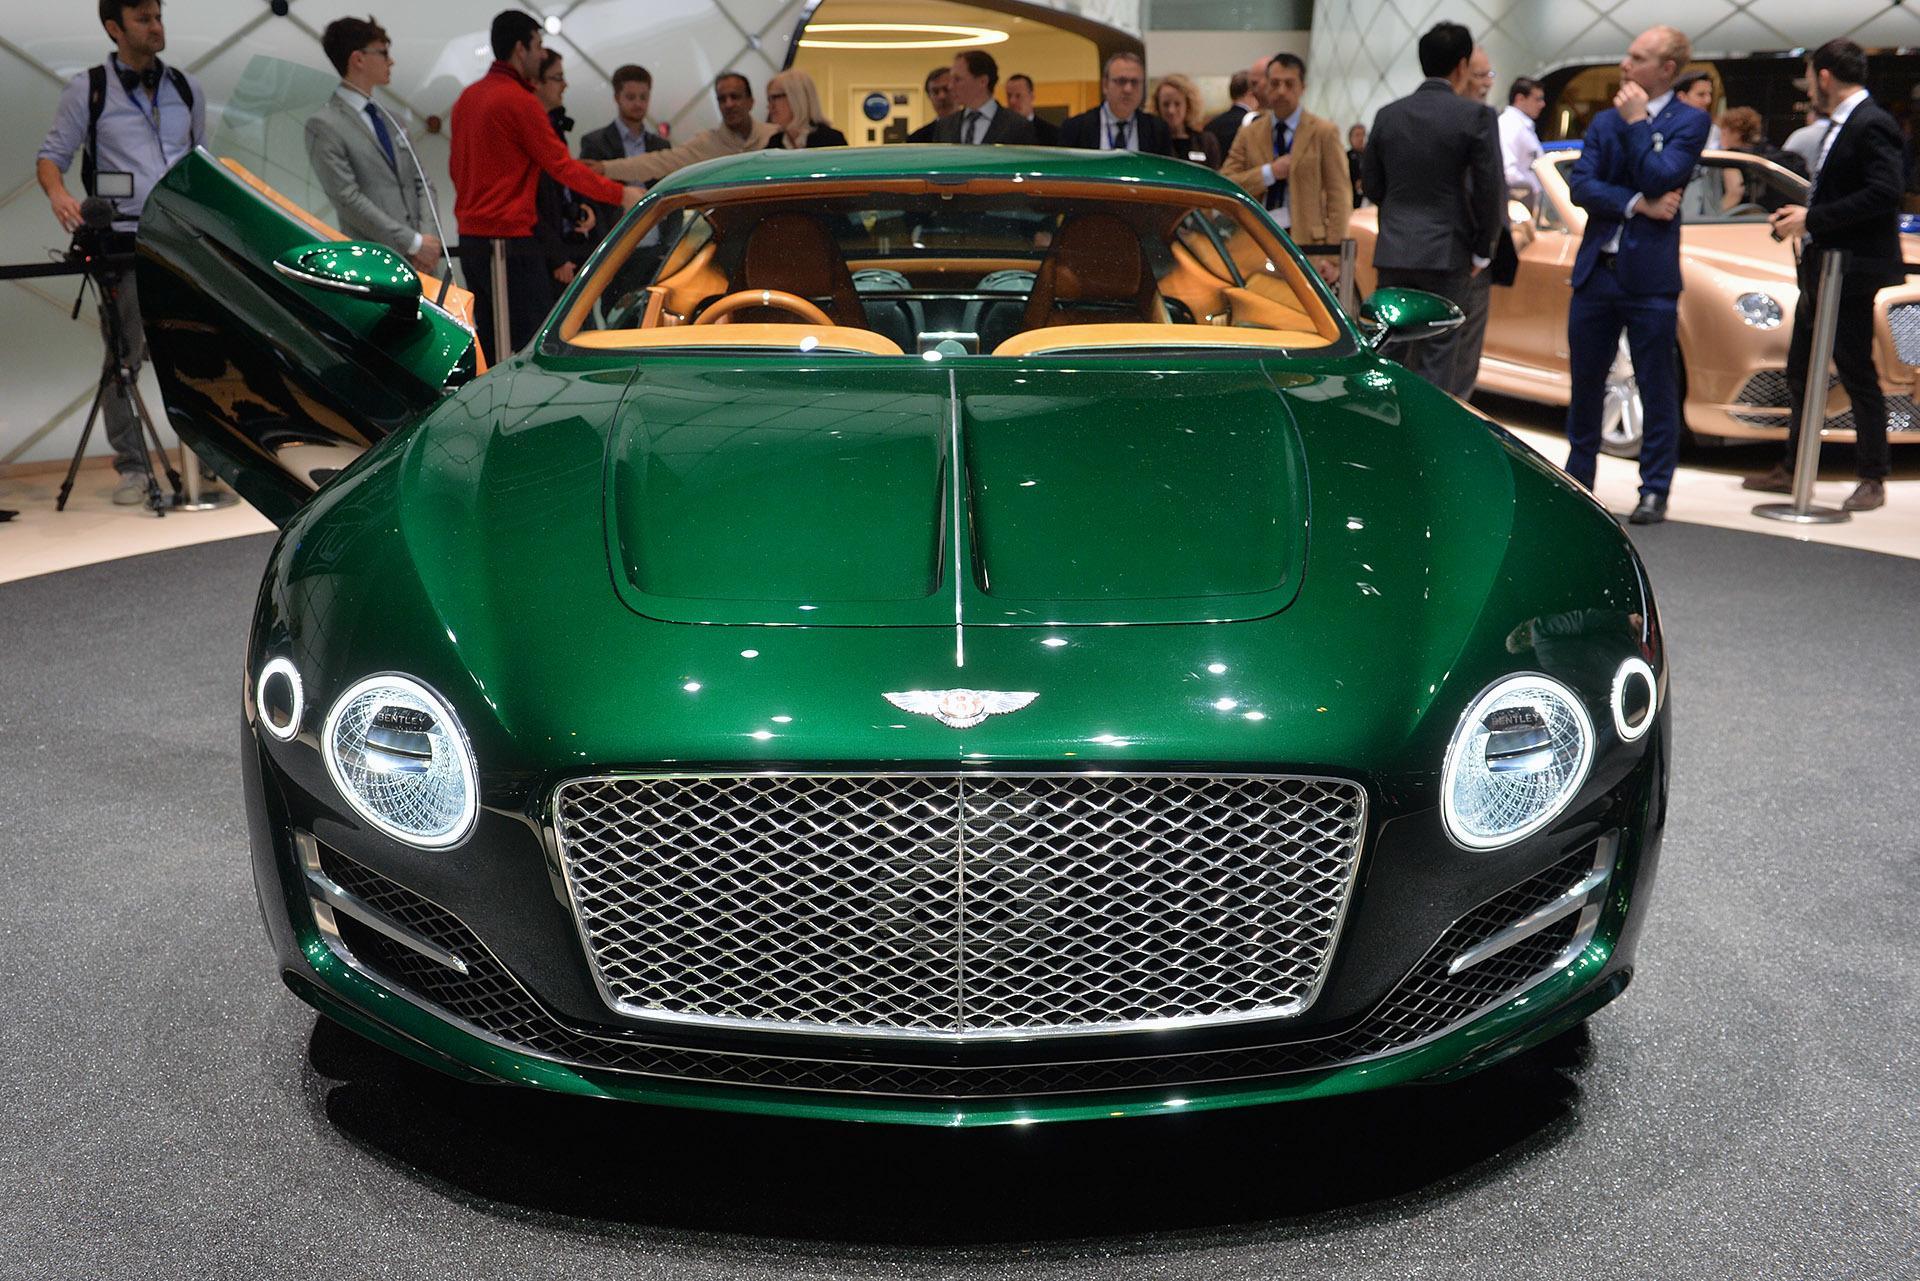 Бентли EXP10 Speed стал самым красивым автомобилем вмире